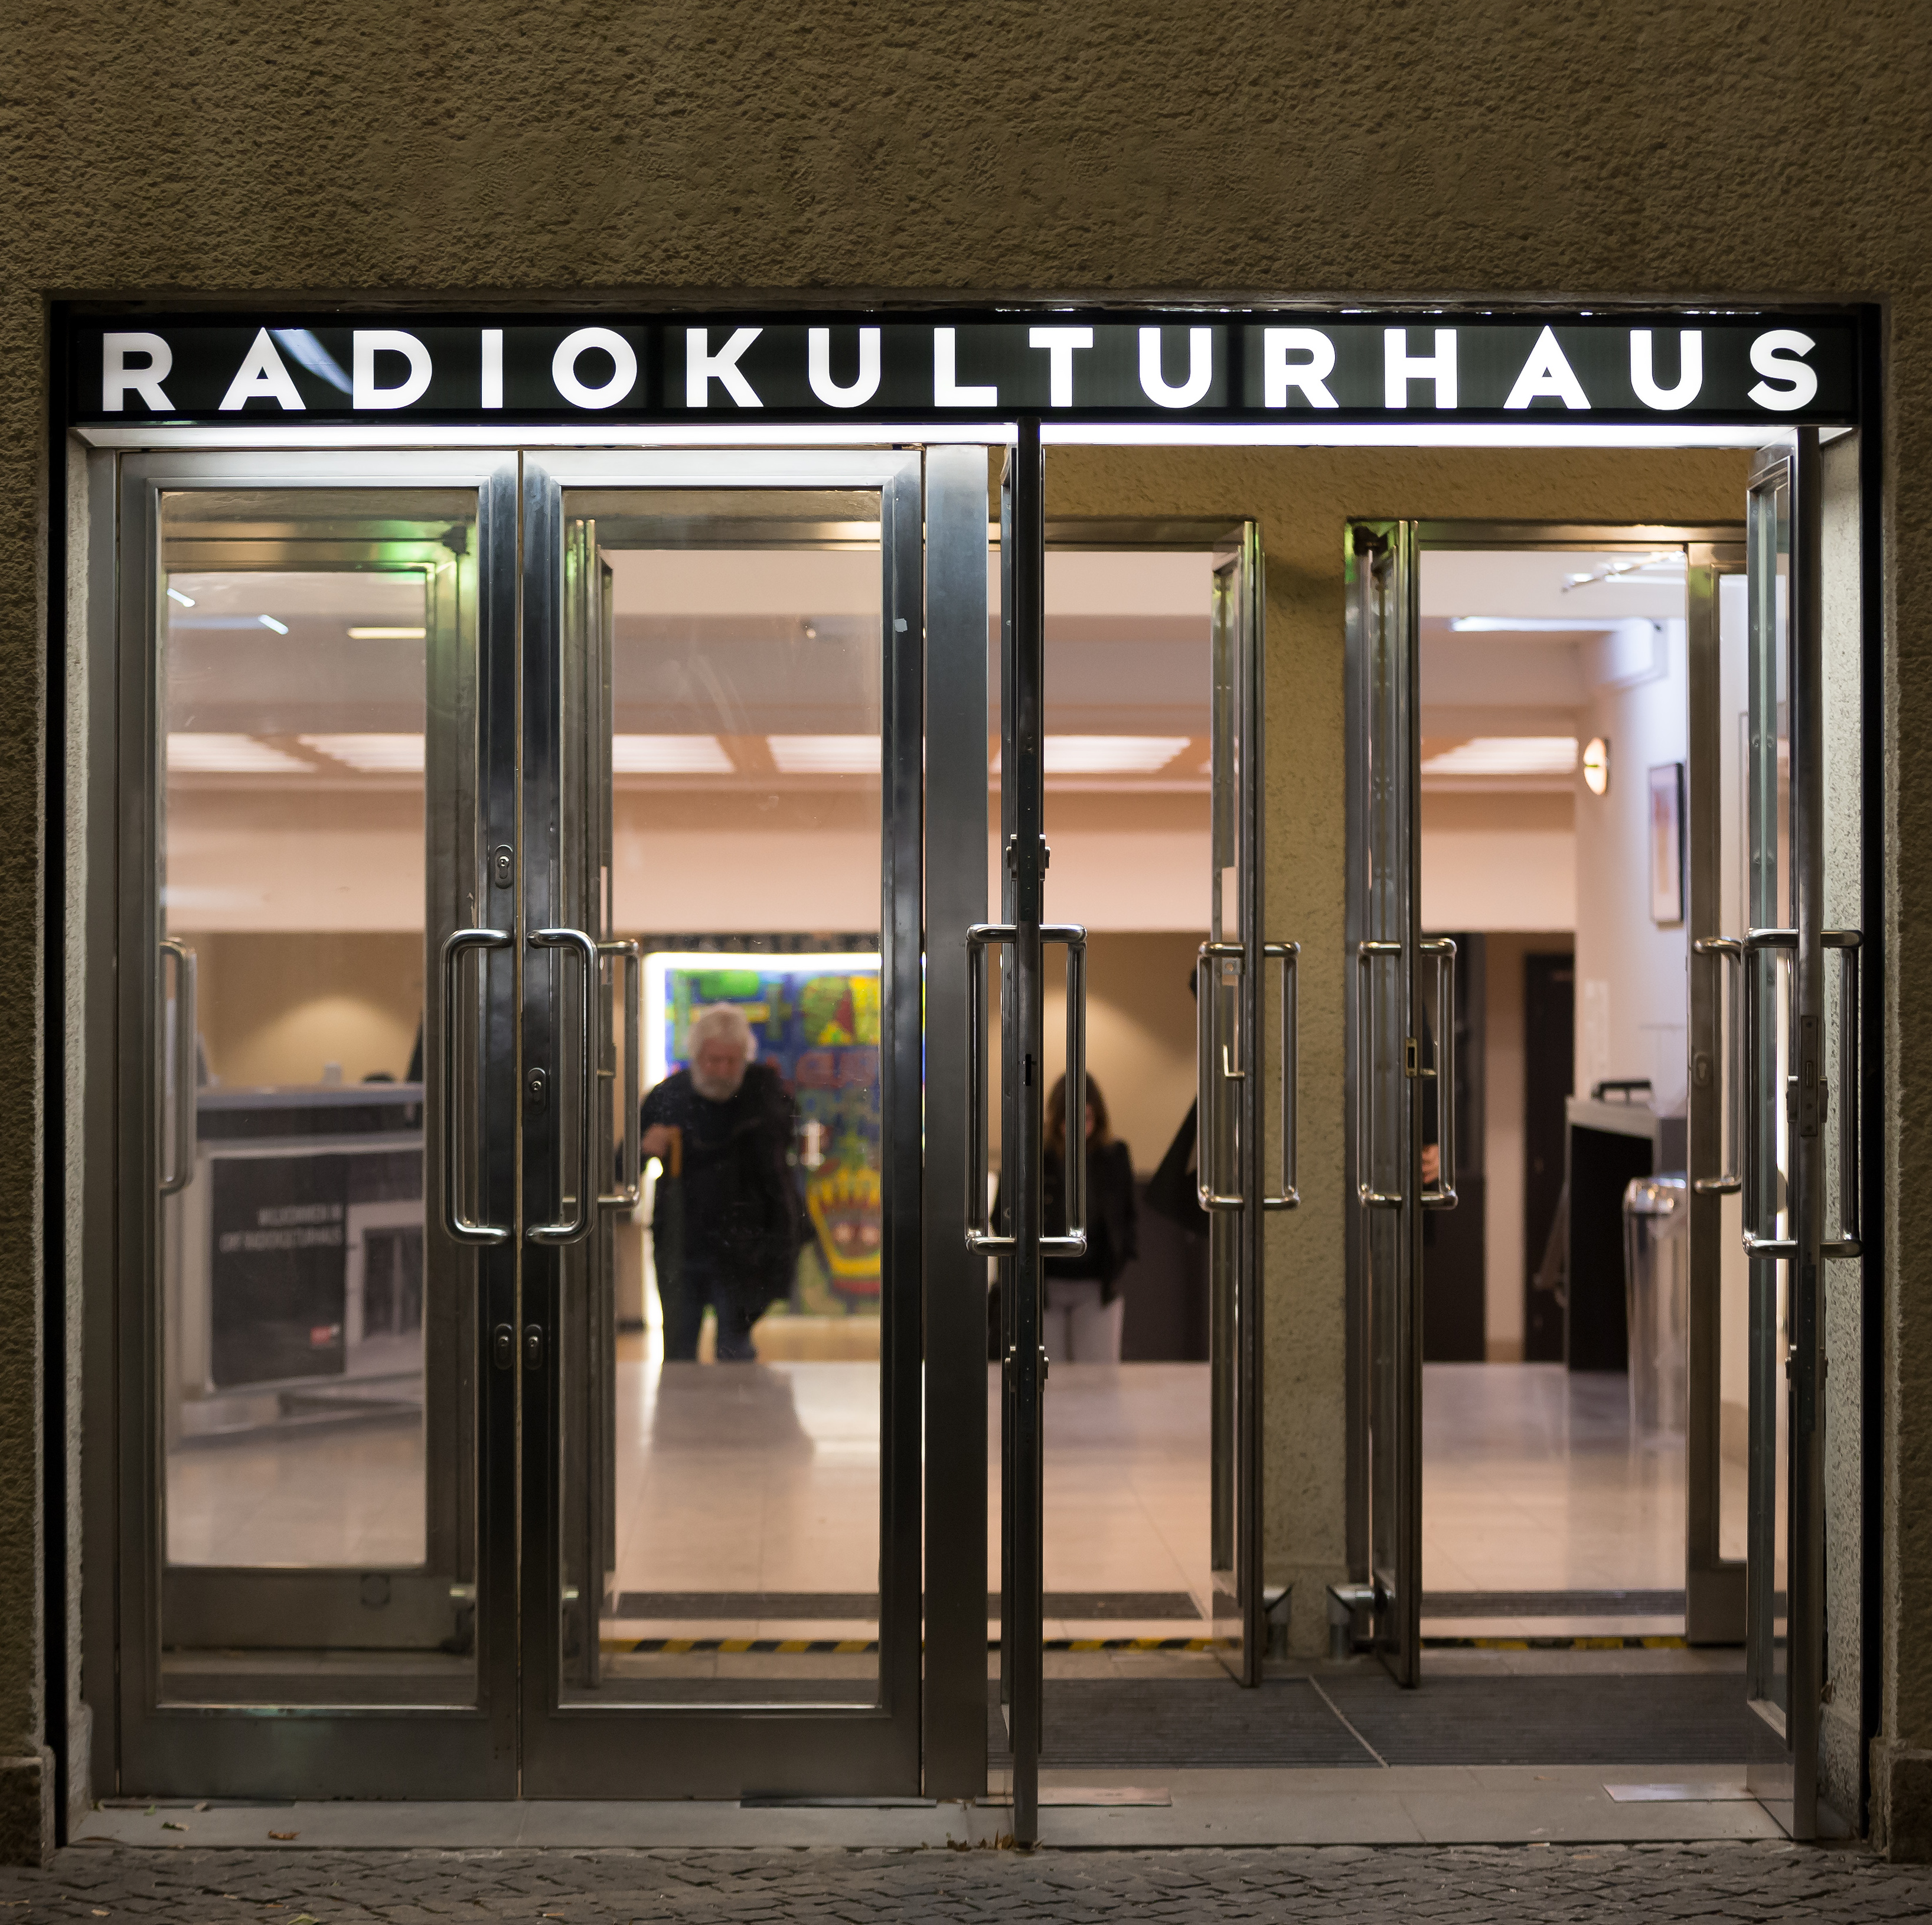 Radiokulturhaus